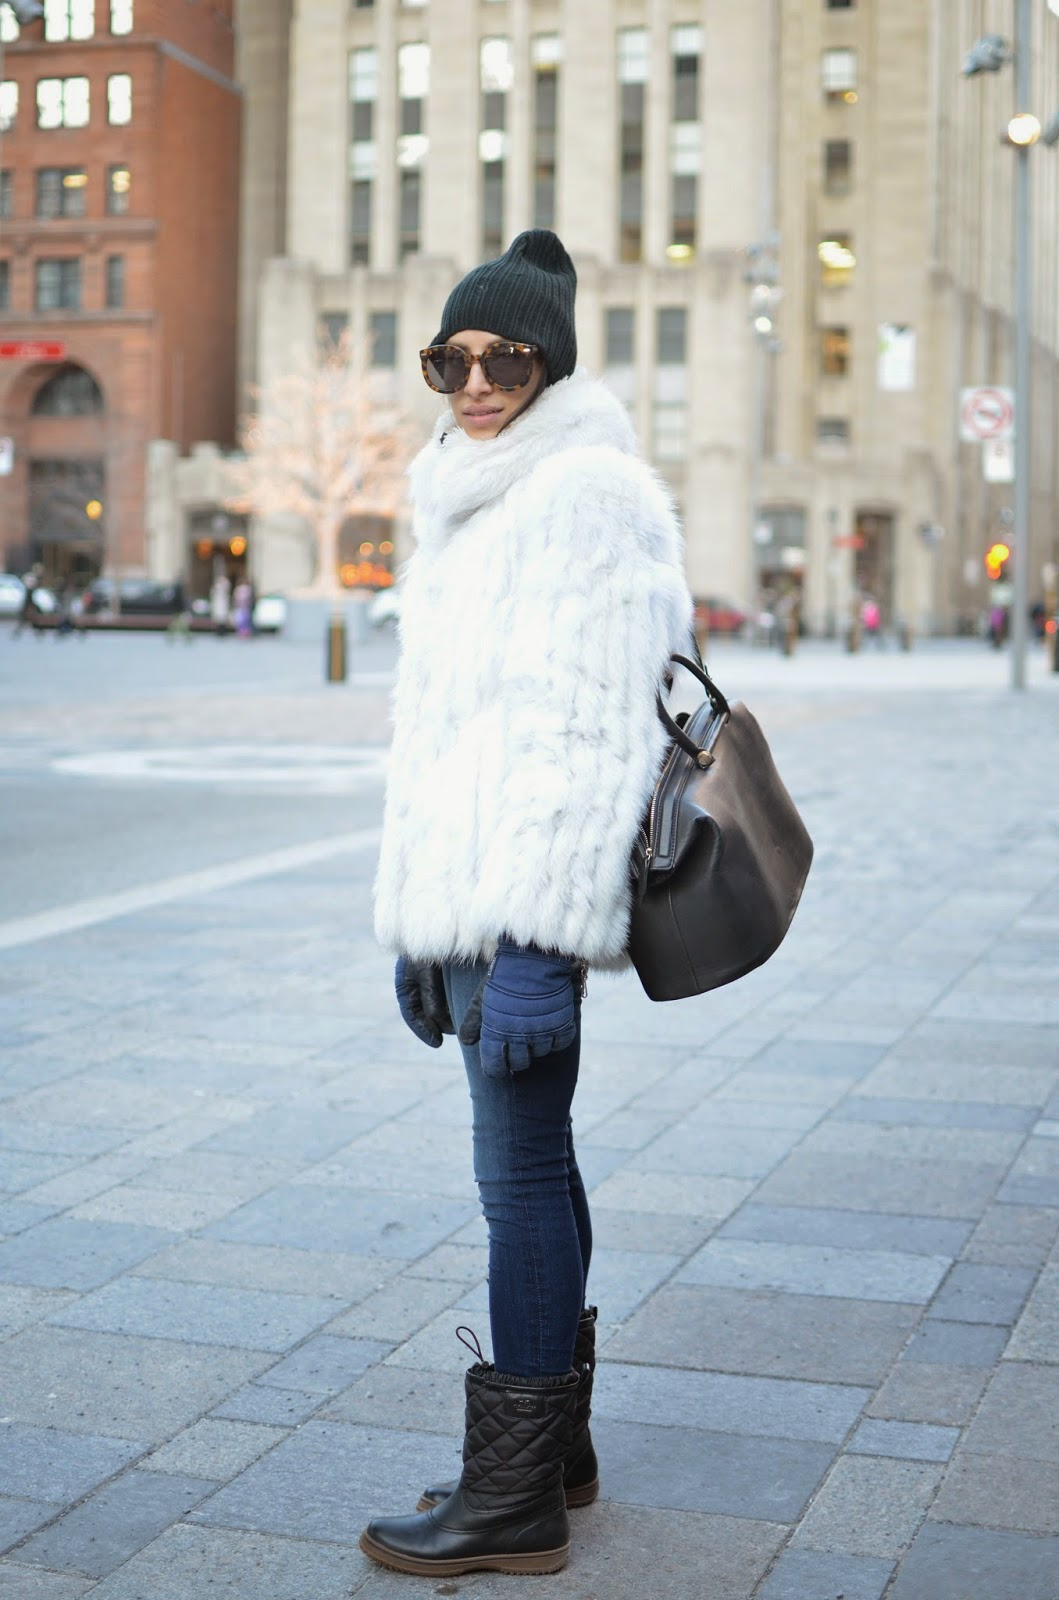 Karen Walker Super sunglasses, winter style, vintage, vintage fur, Montreal, Montreal style, Old Montreal